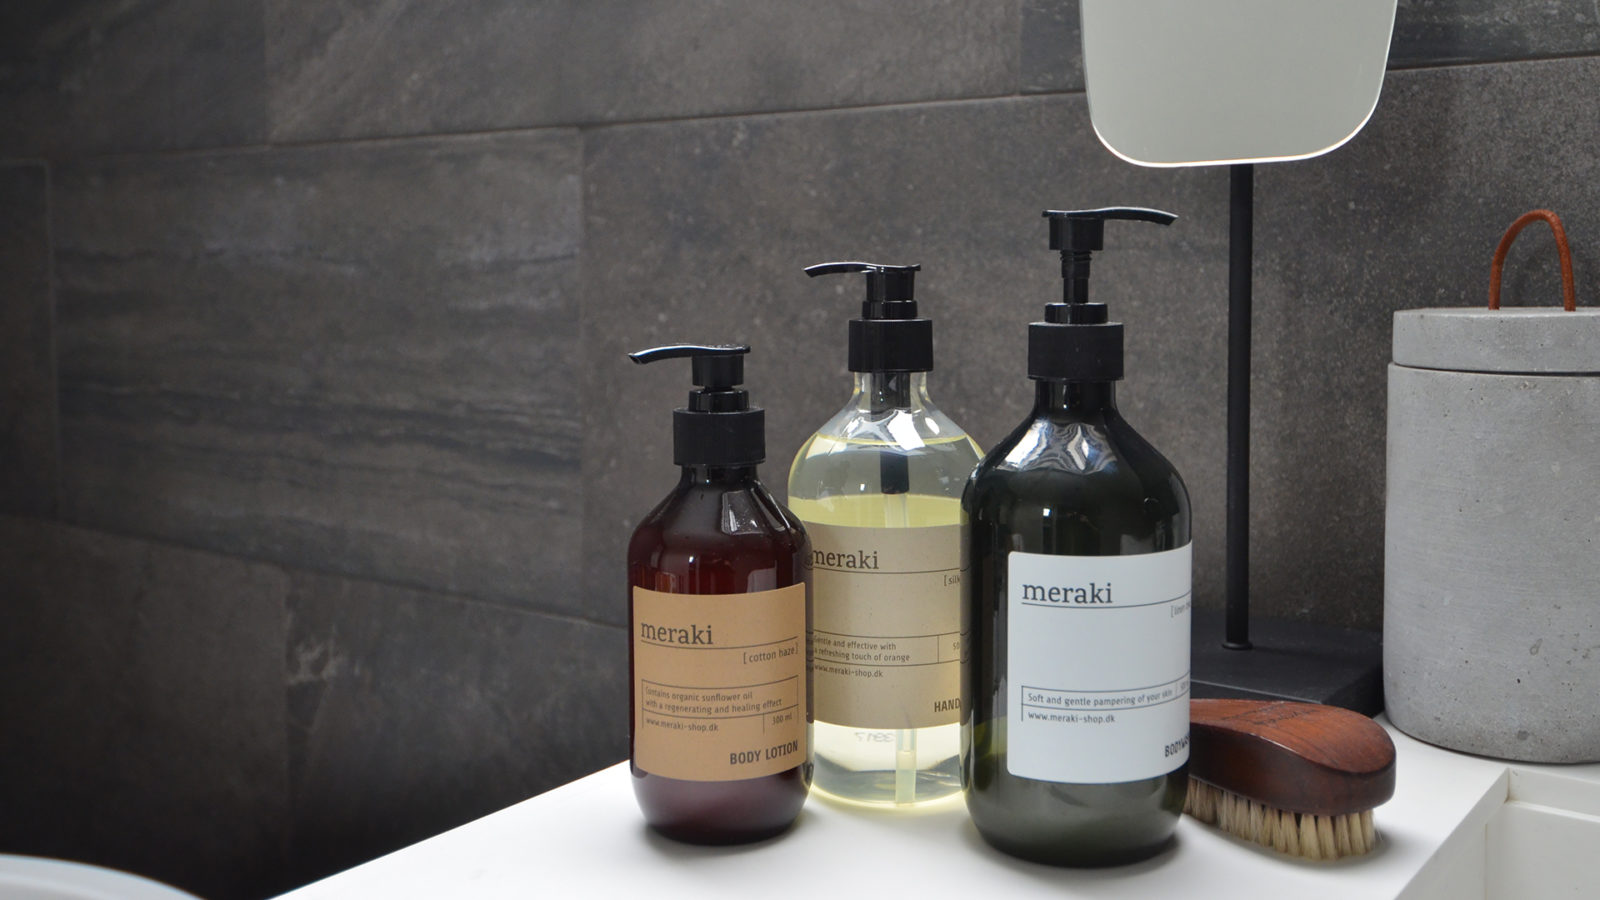 meraki body wash, lotion and liquid soap